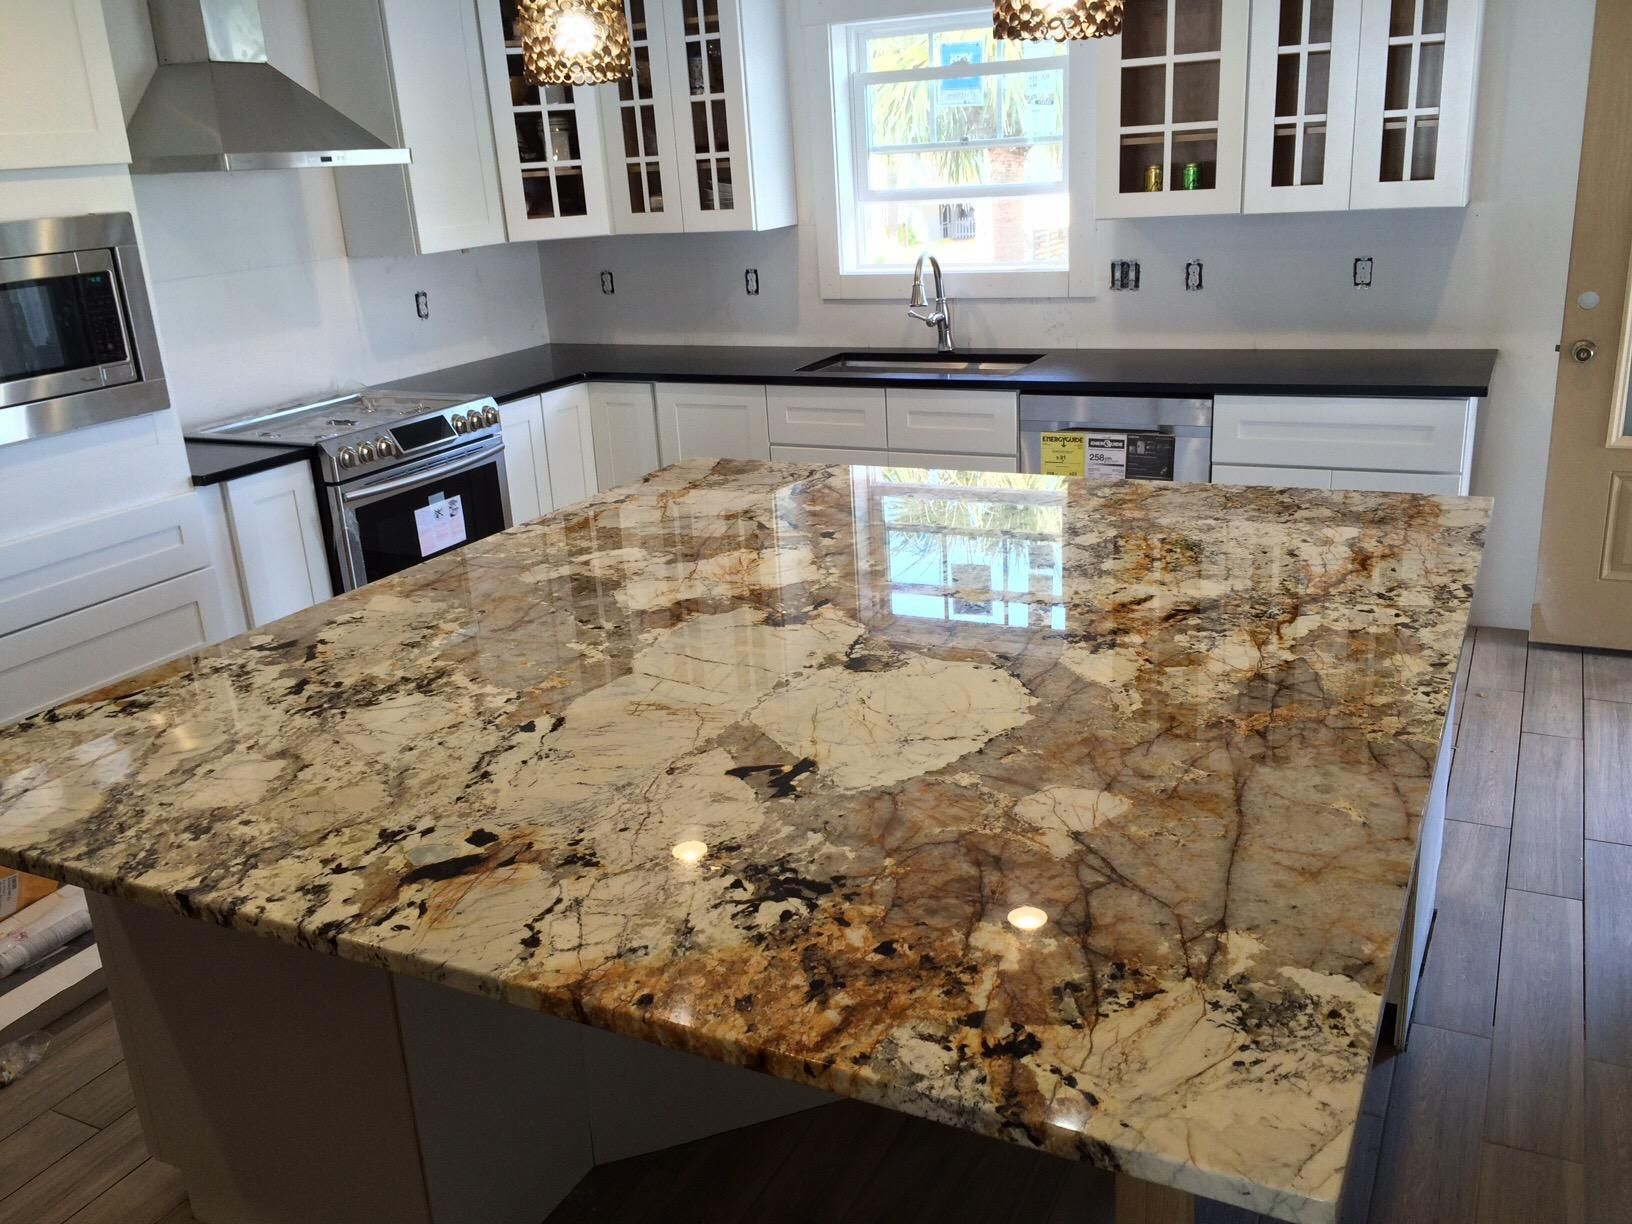 99 Granite Countertops Savannah Ga Kitchen island Countertop